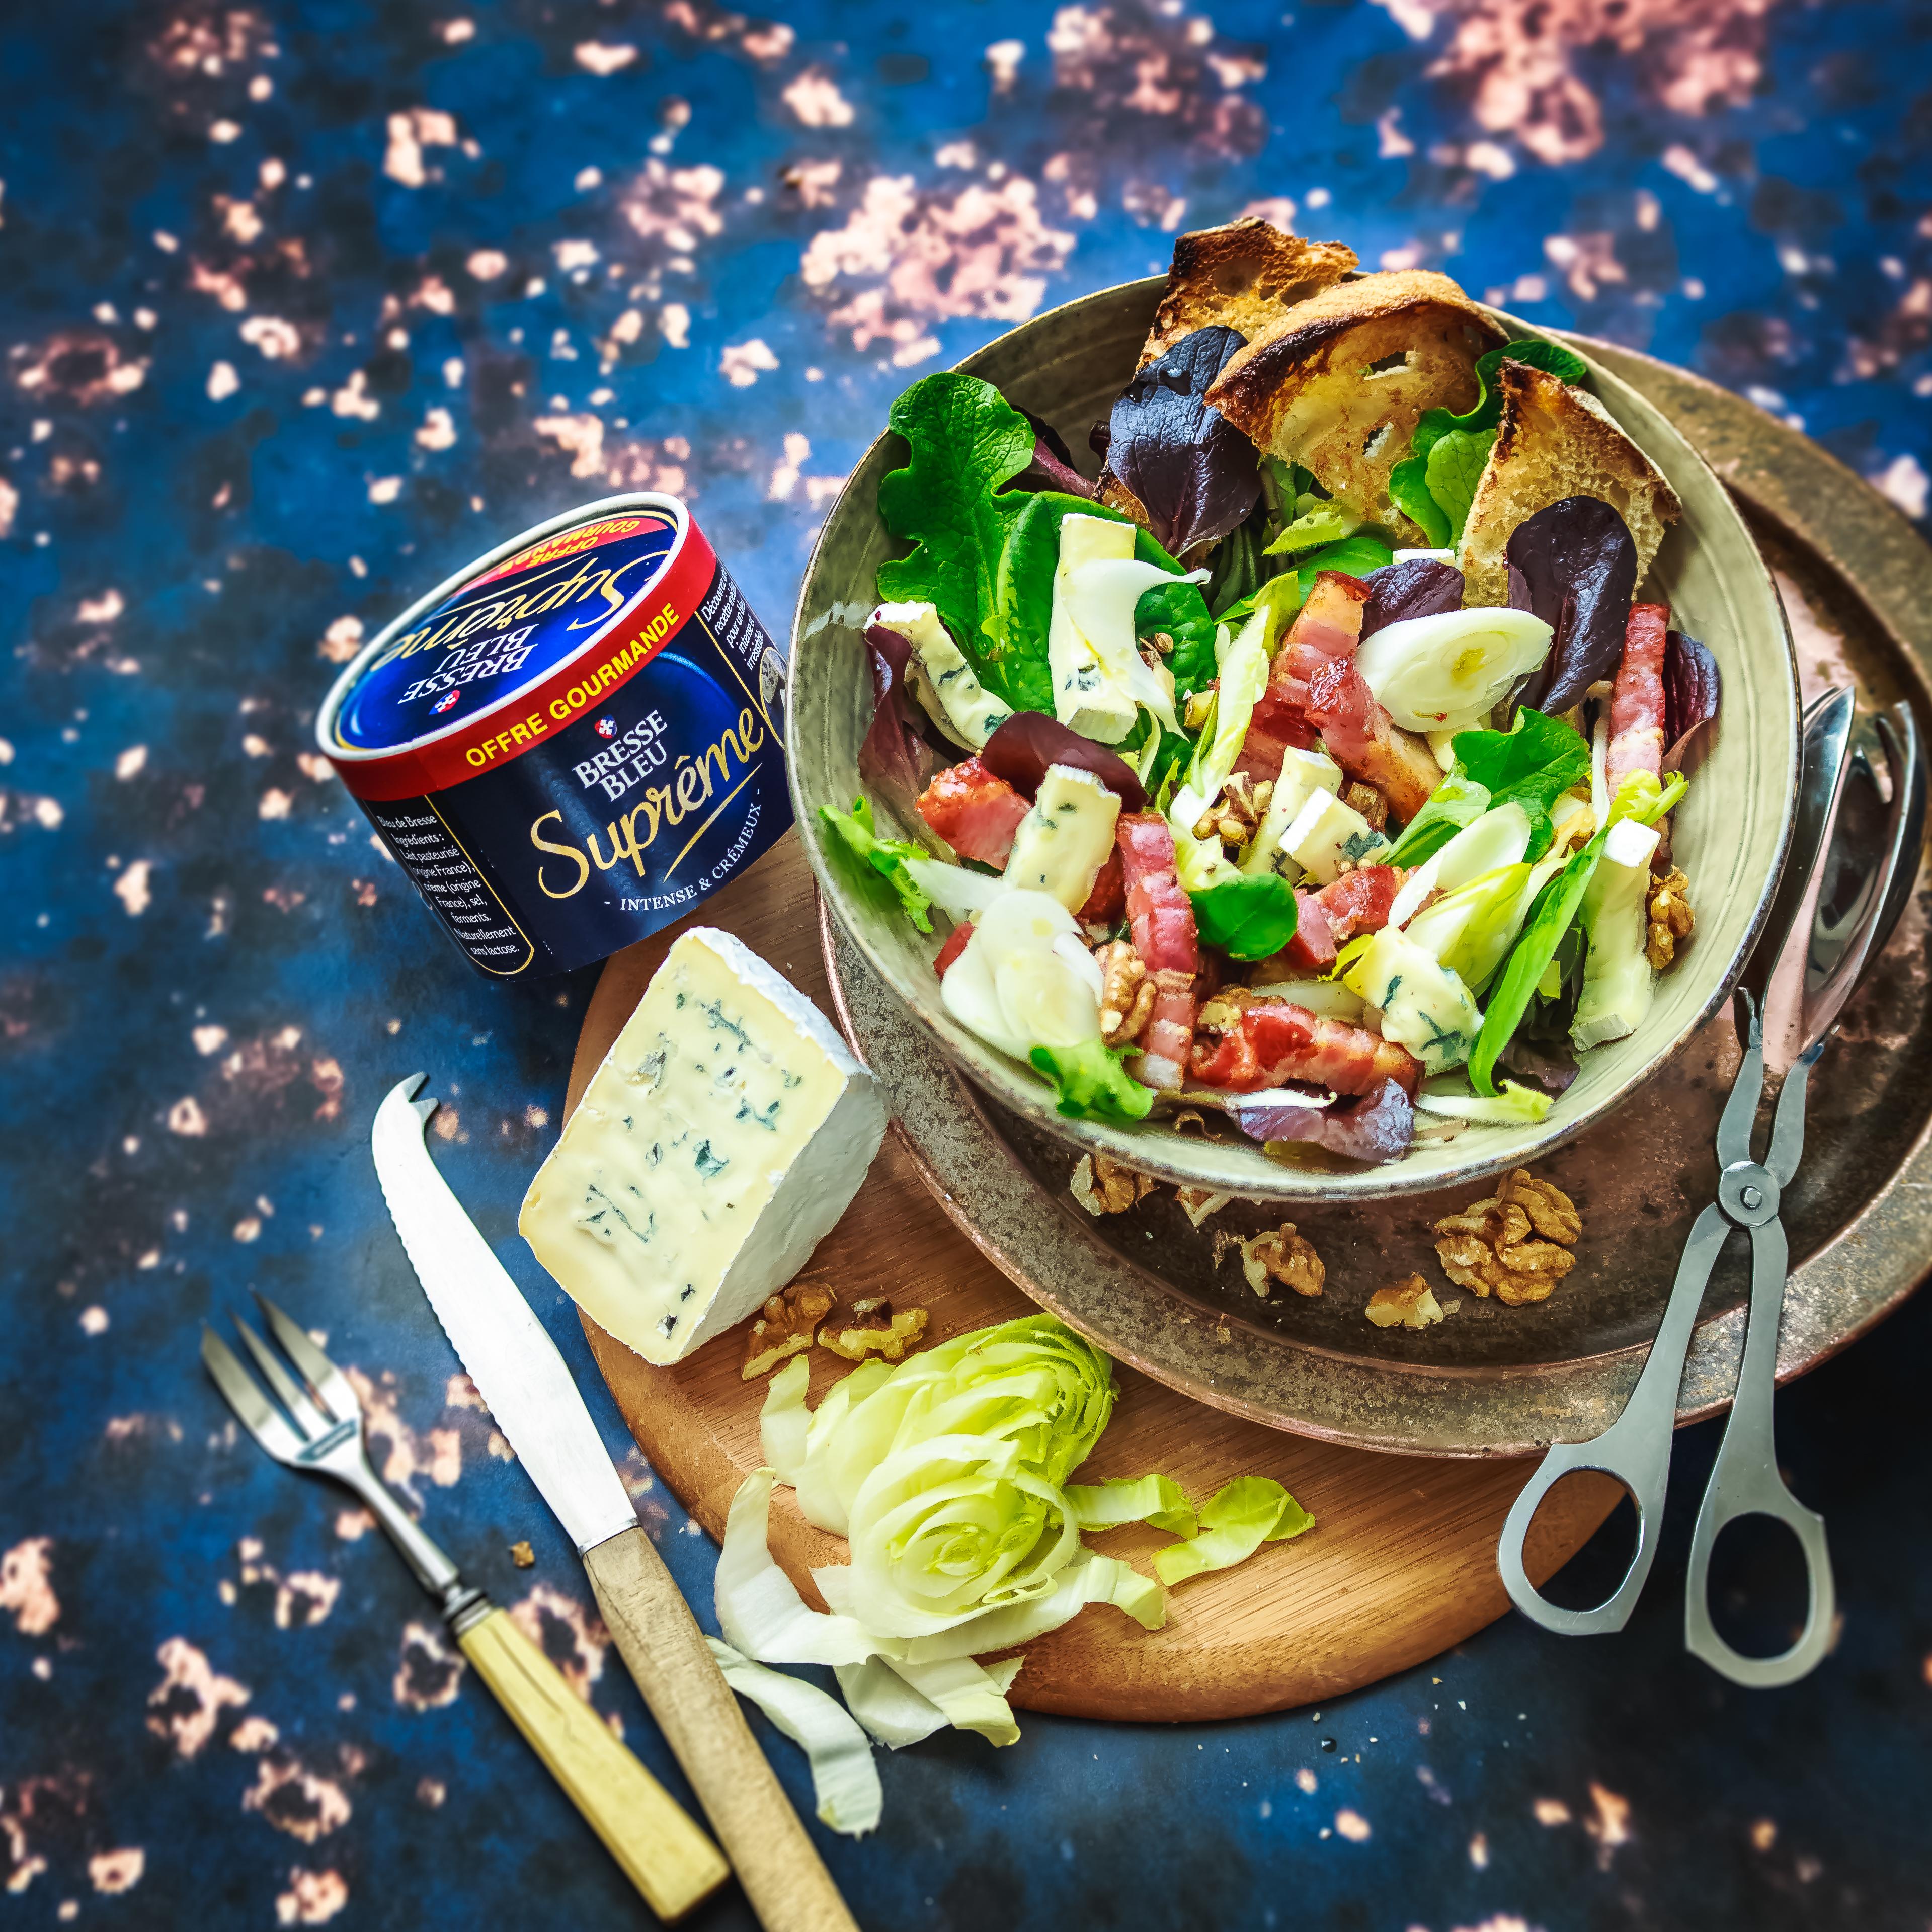 Salade au Bresse bleu, lards, endives, noix et endives